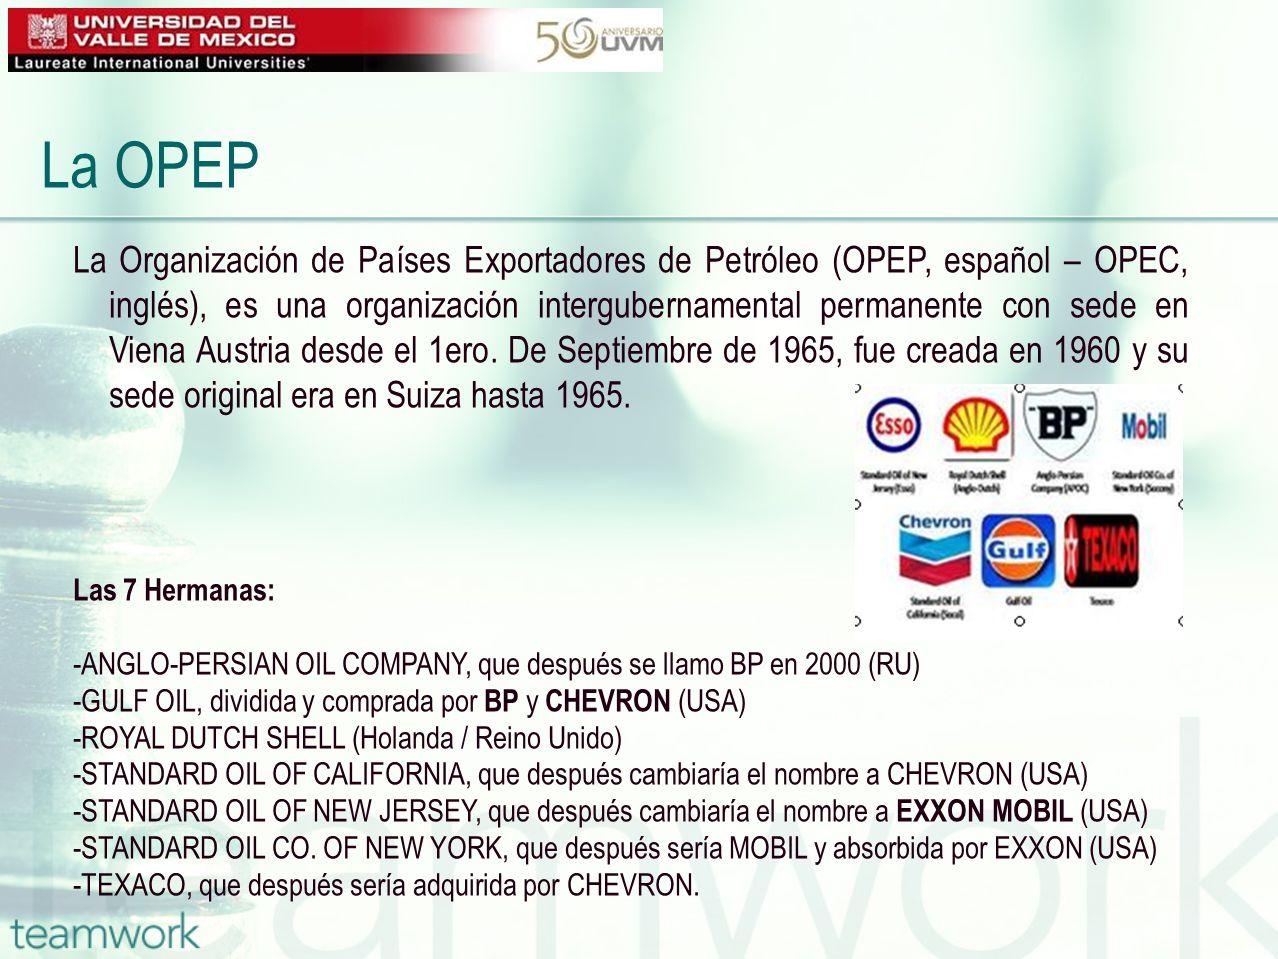 La OPEP